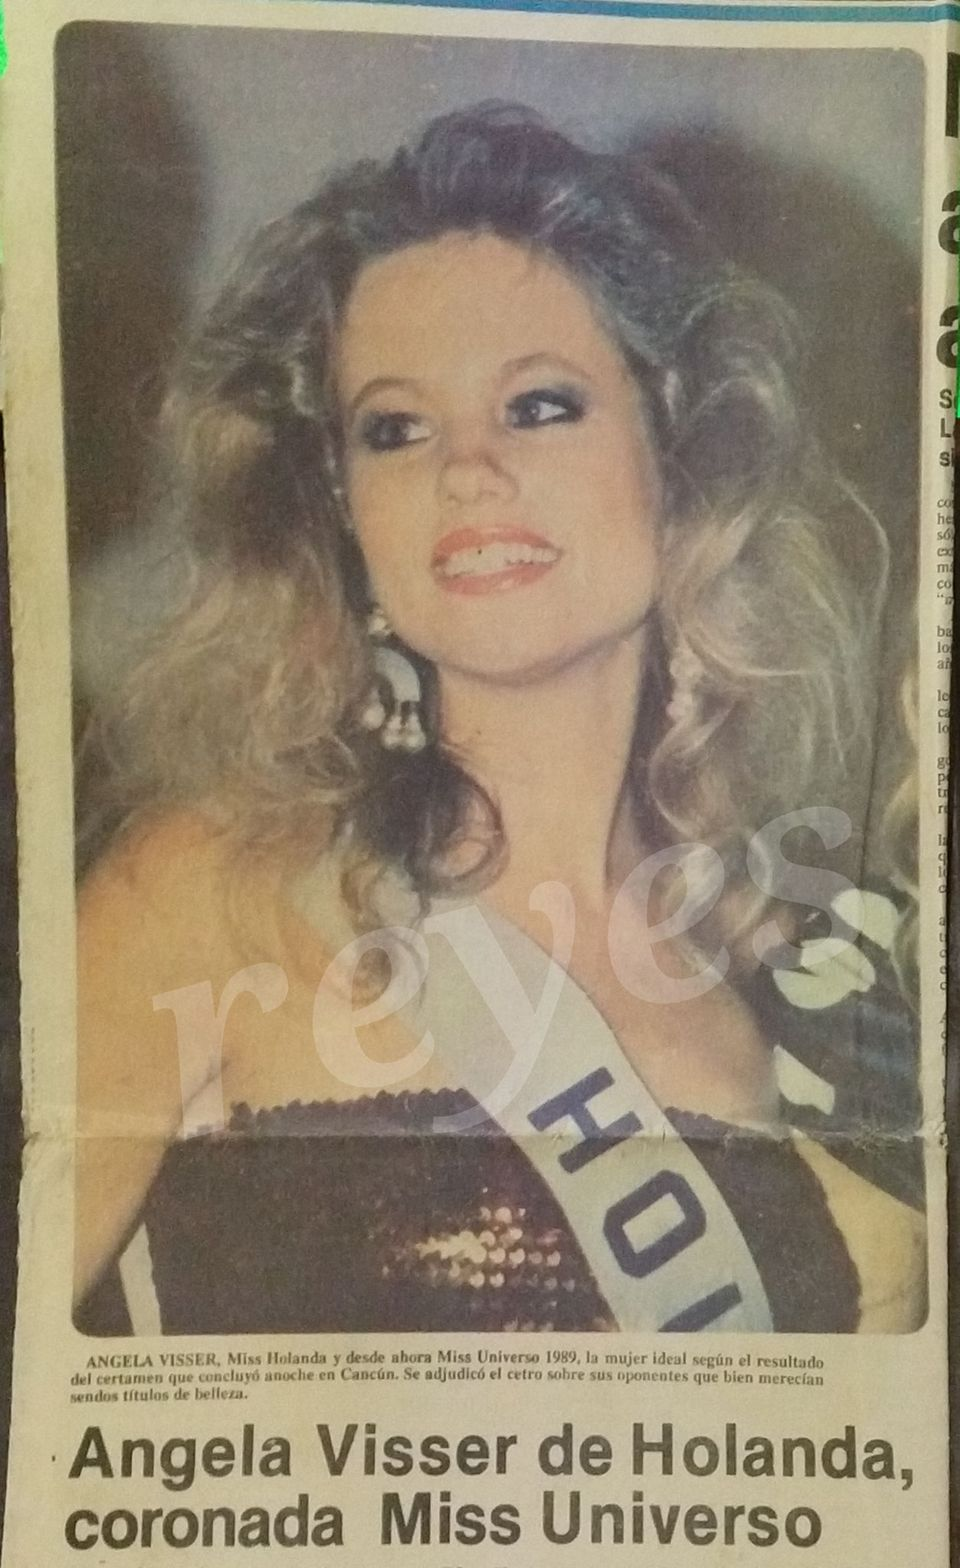 angela visser, miss universe 1989. - Página 3 23336310